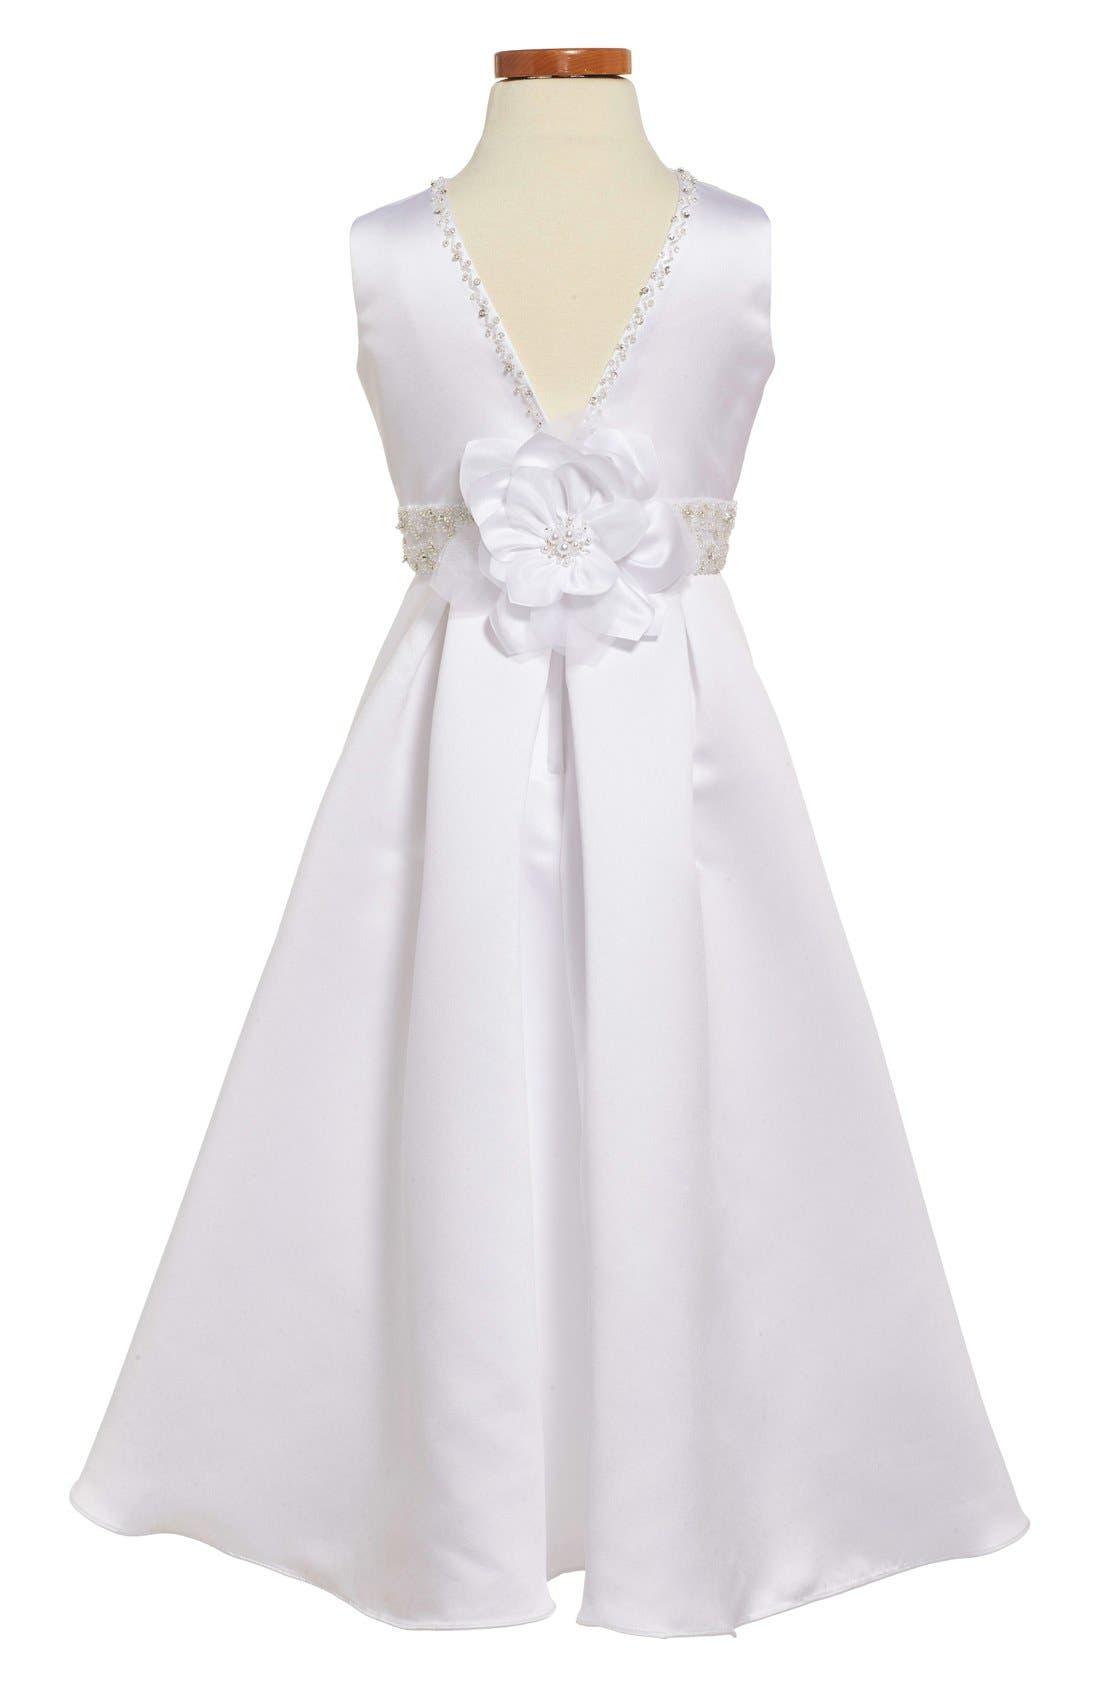 JOAN CALABRESE FOR MON CHERI,                             Satin First Communion Dress,                             Alternate thumbnail 2, color,                             100